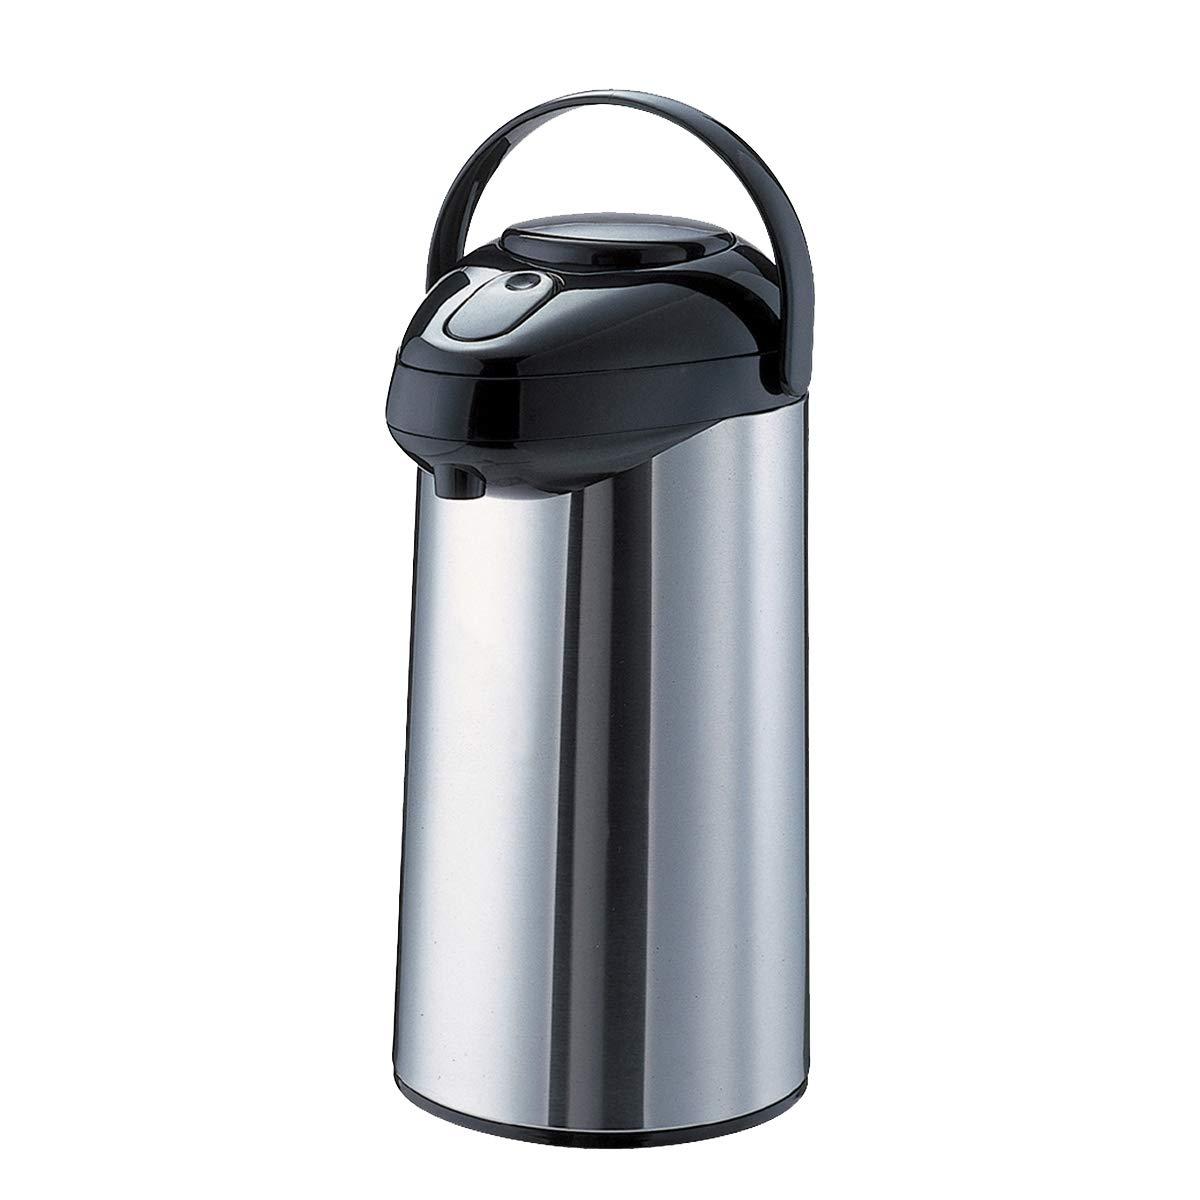 Service Ideas SSA300 SteelVac Airpot, Stainless Vacuum, 3 L